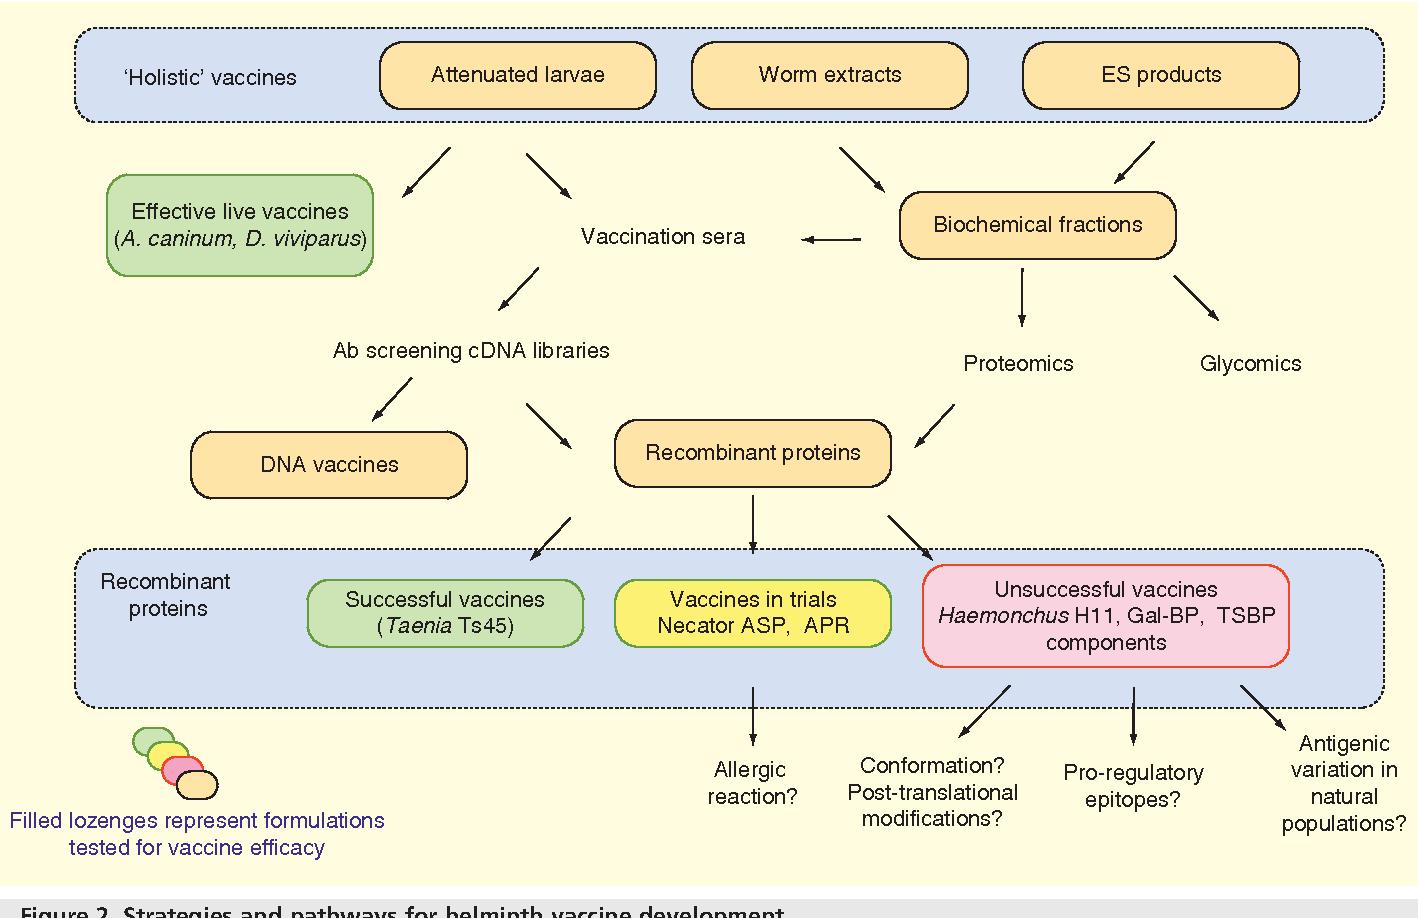 schistosomiasis vaccine development